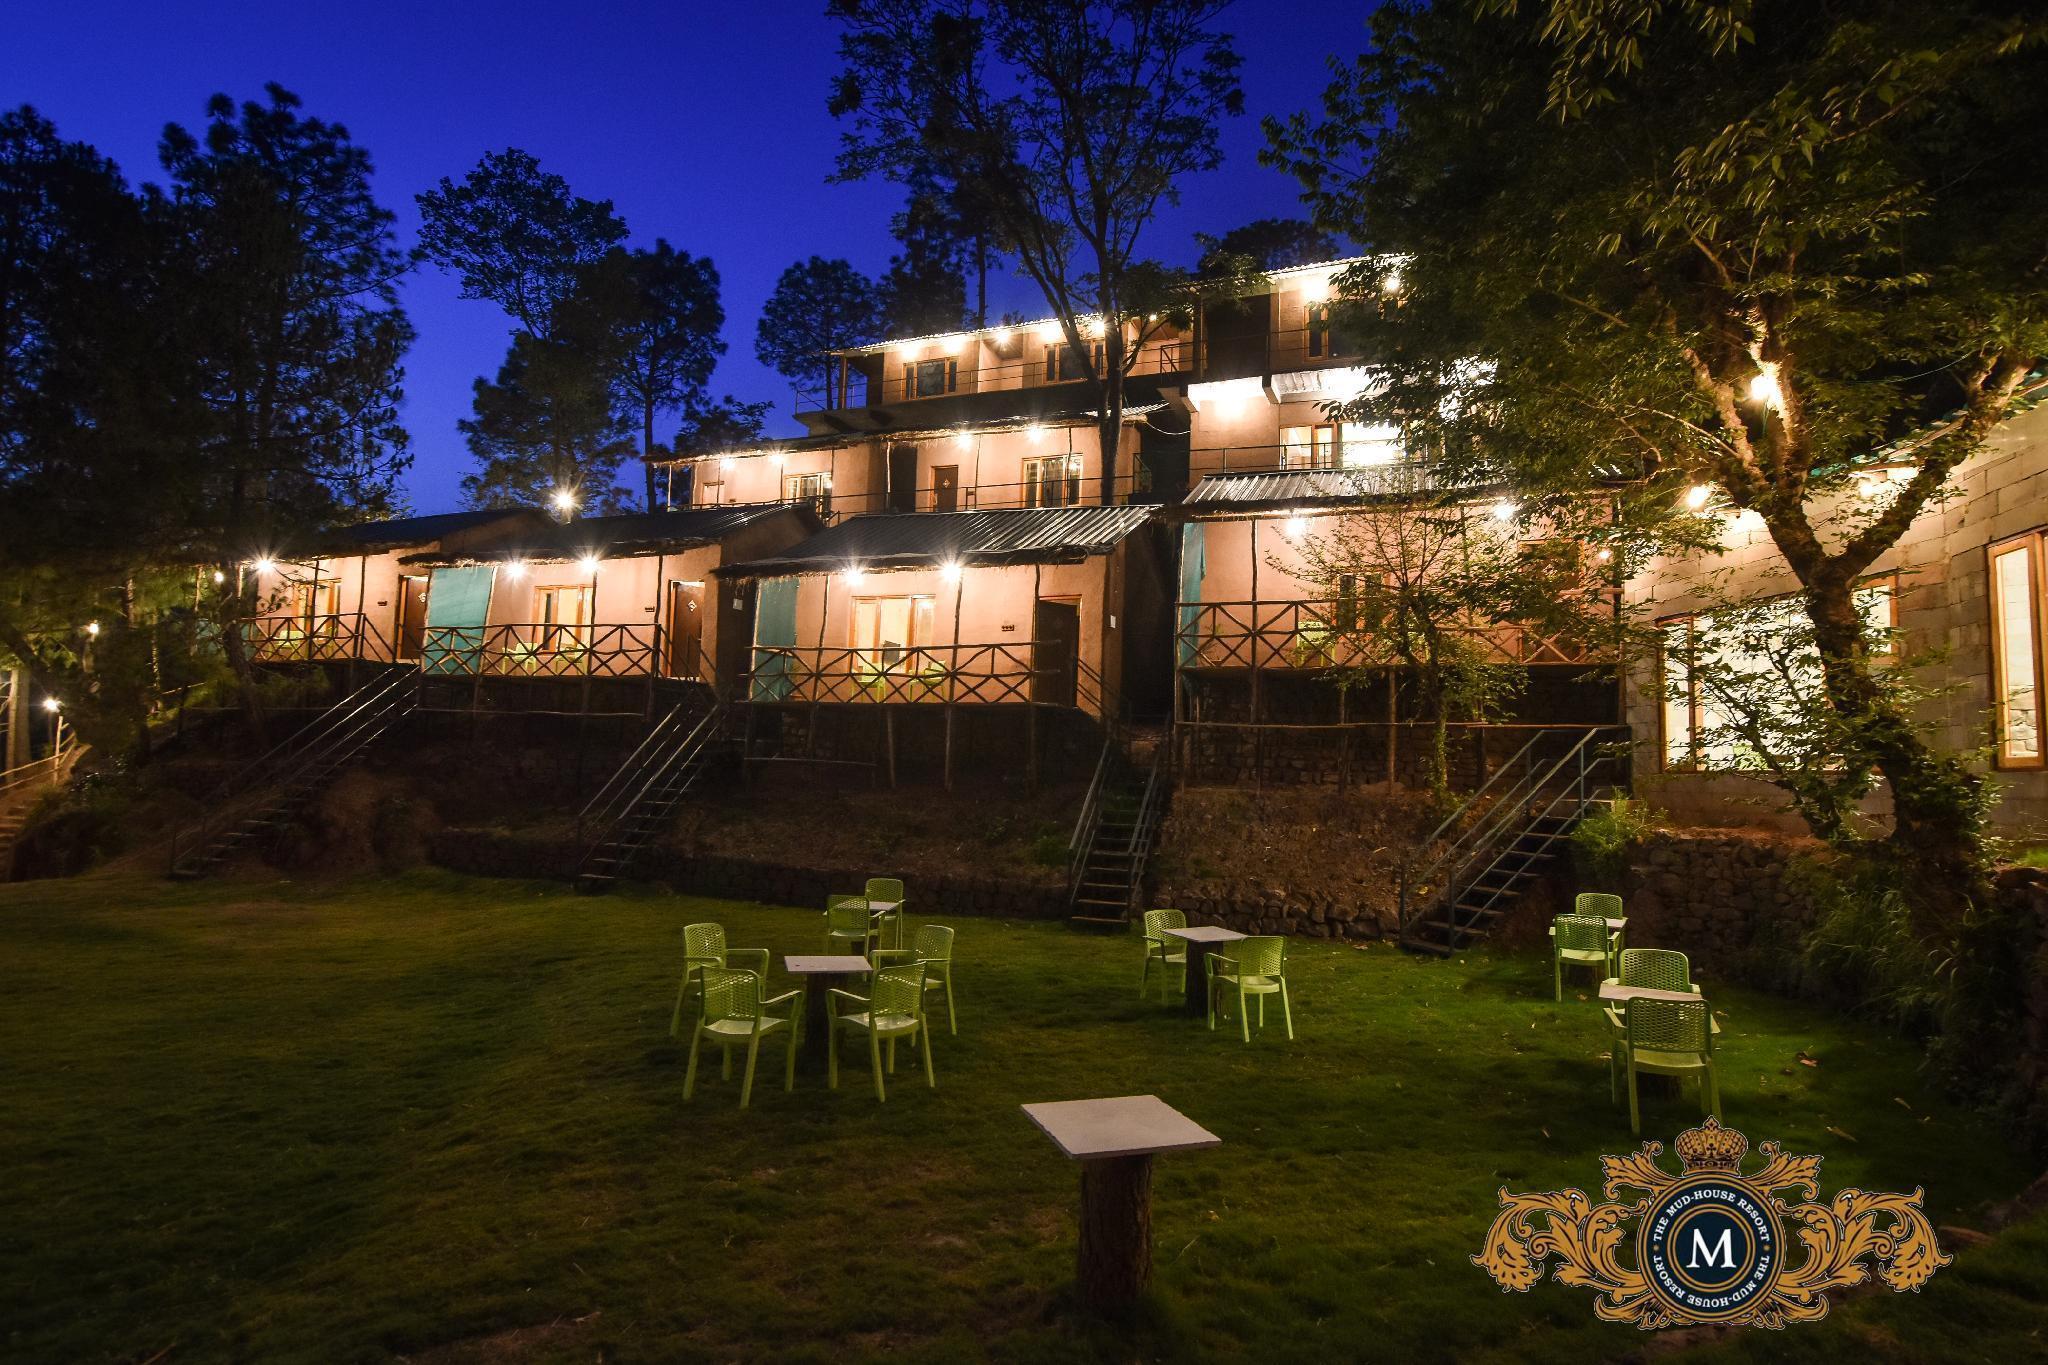 The Mud House Resort